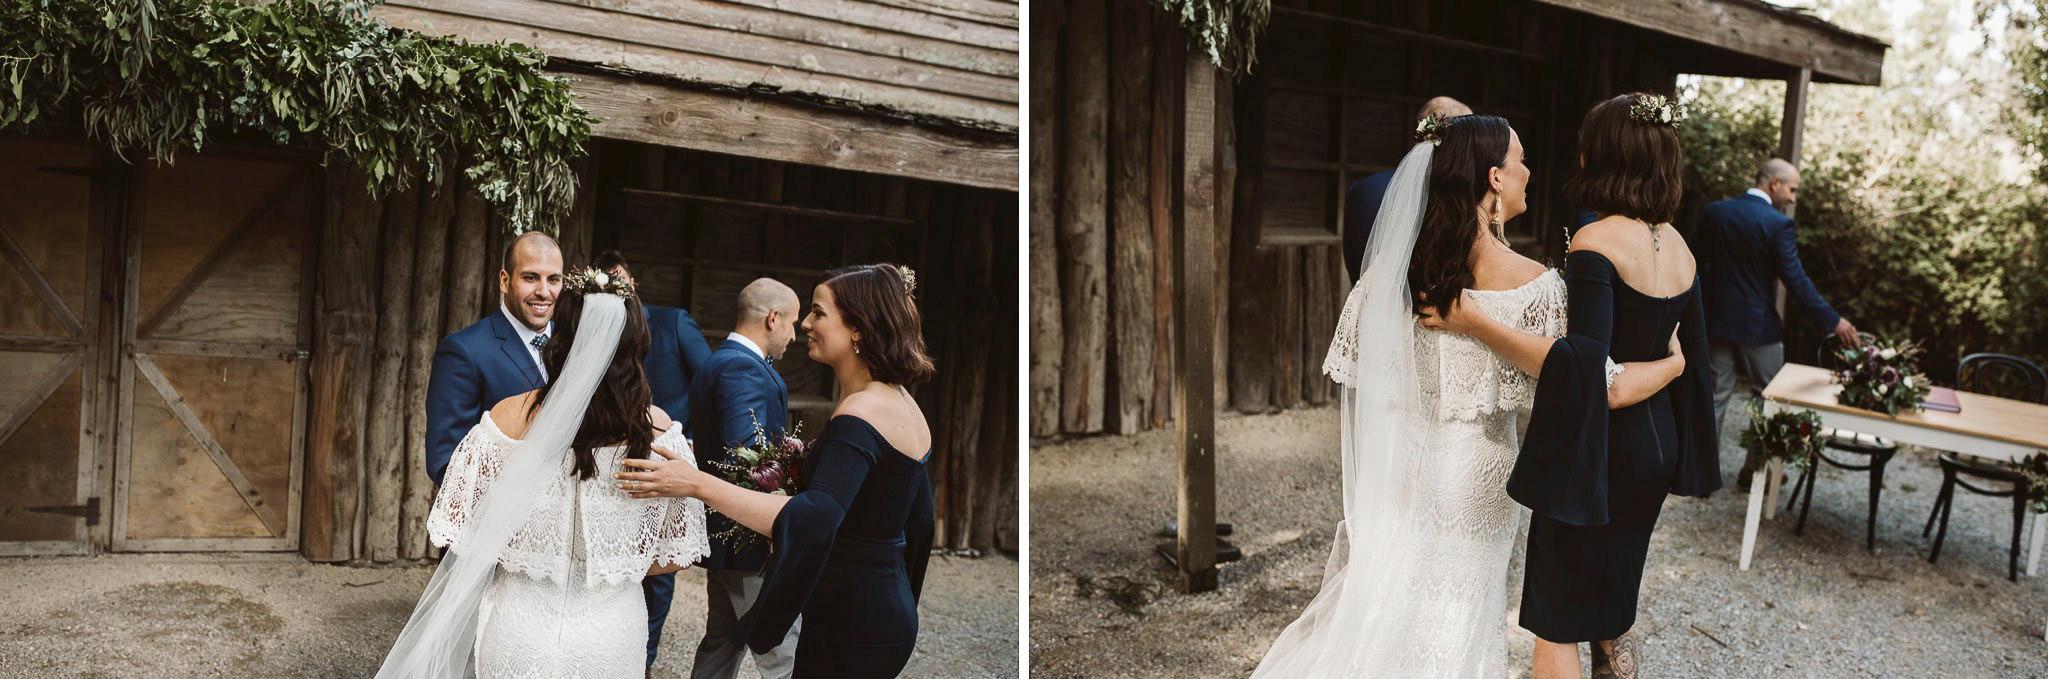 The Farm Yarra Valley Wedding Photography Ashleigh Haase-54.jpg